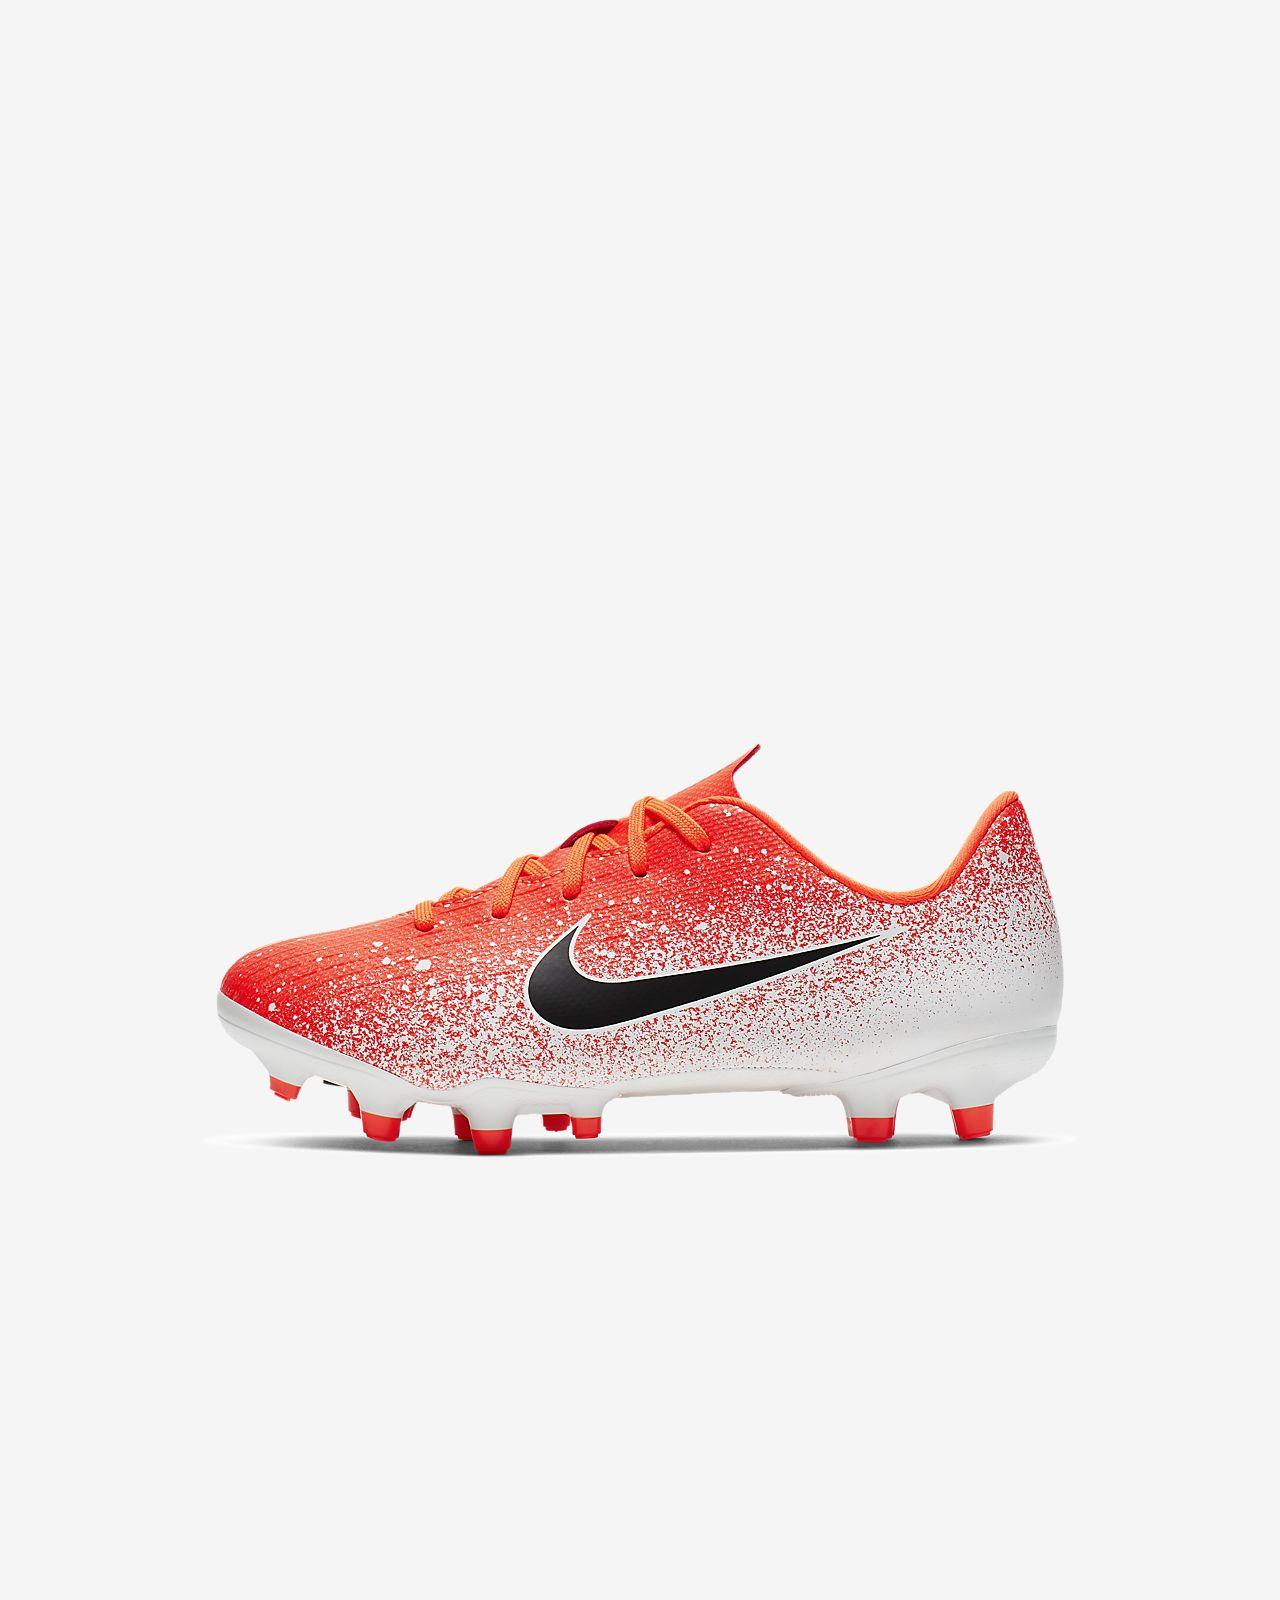 Scarpa da calcio multiterreno Nike Jr. MercurialX Vapor XII Academy - Bimbi piccoli/Bambini